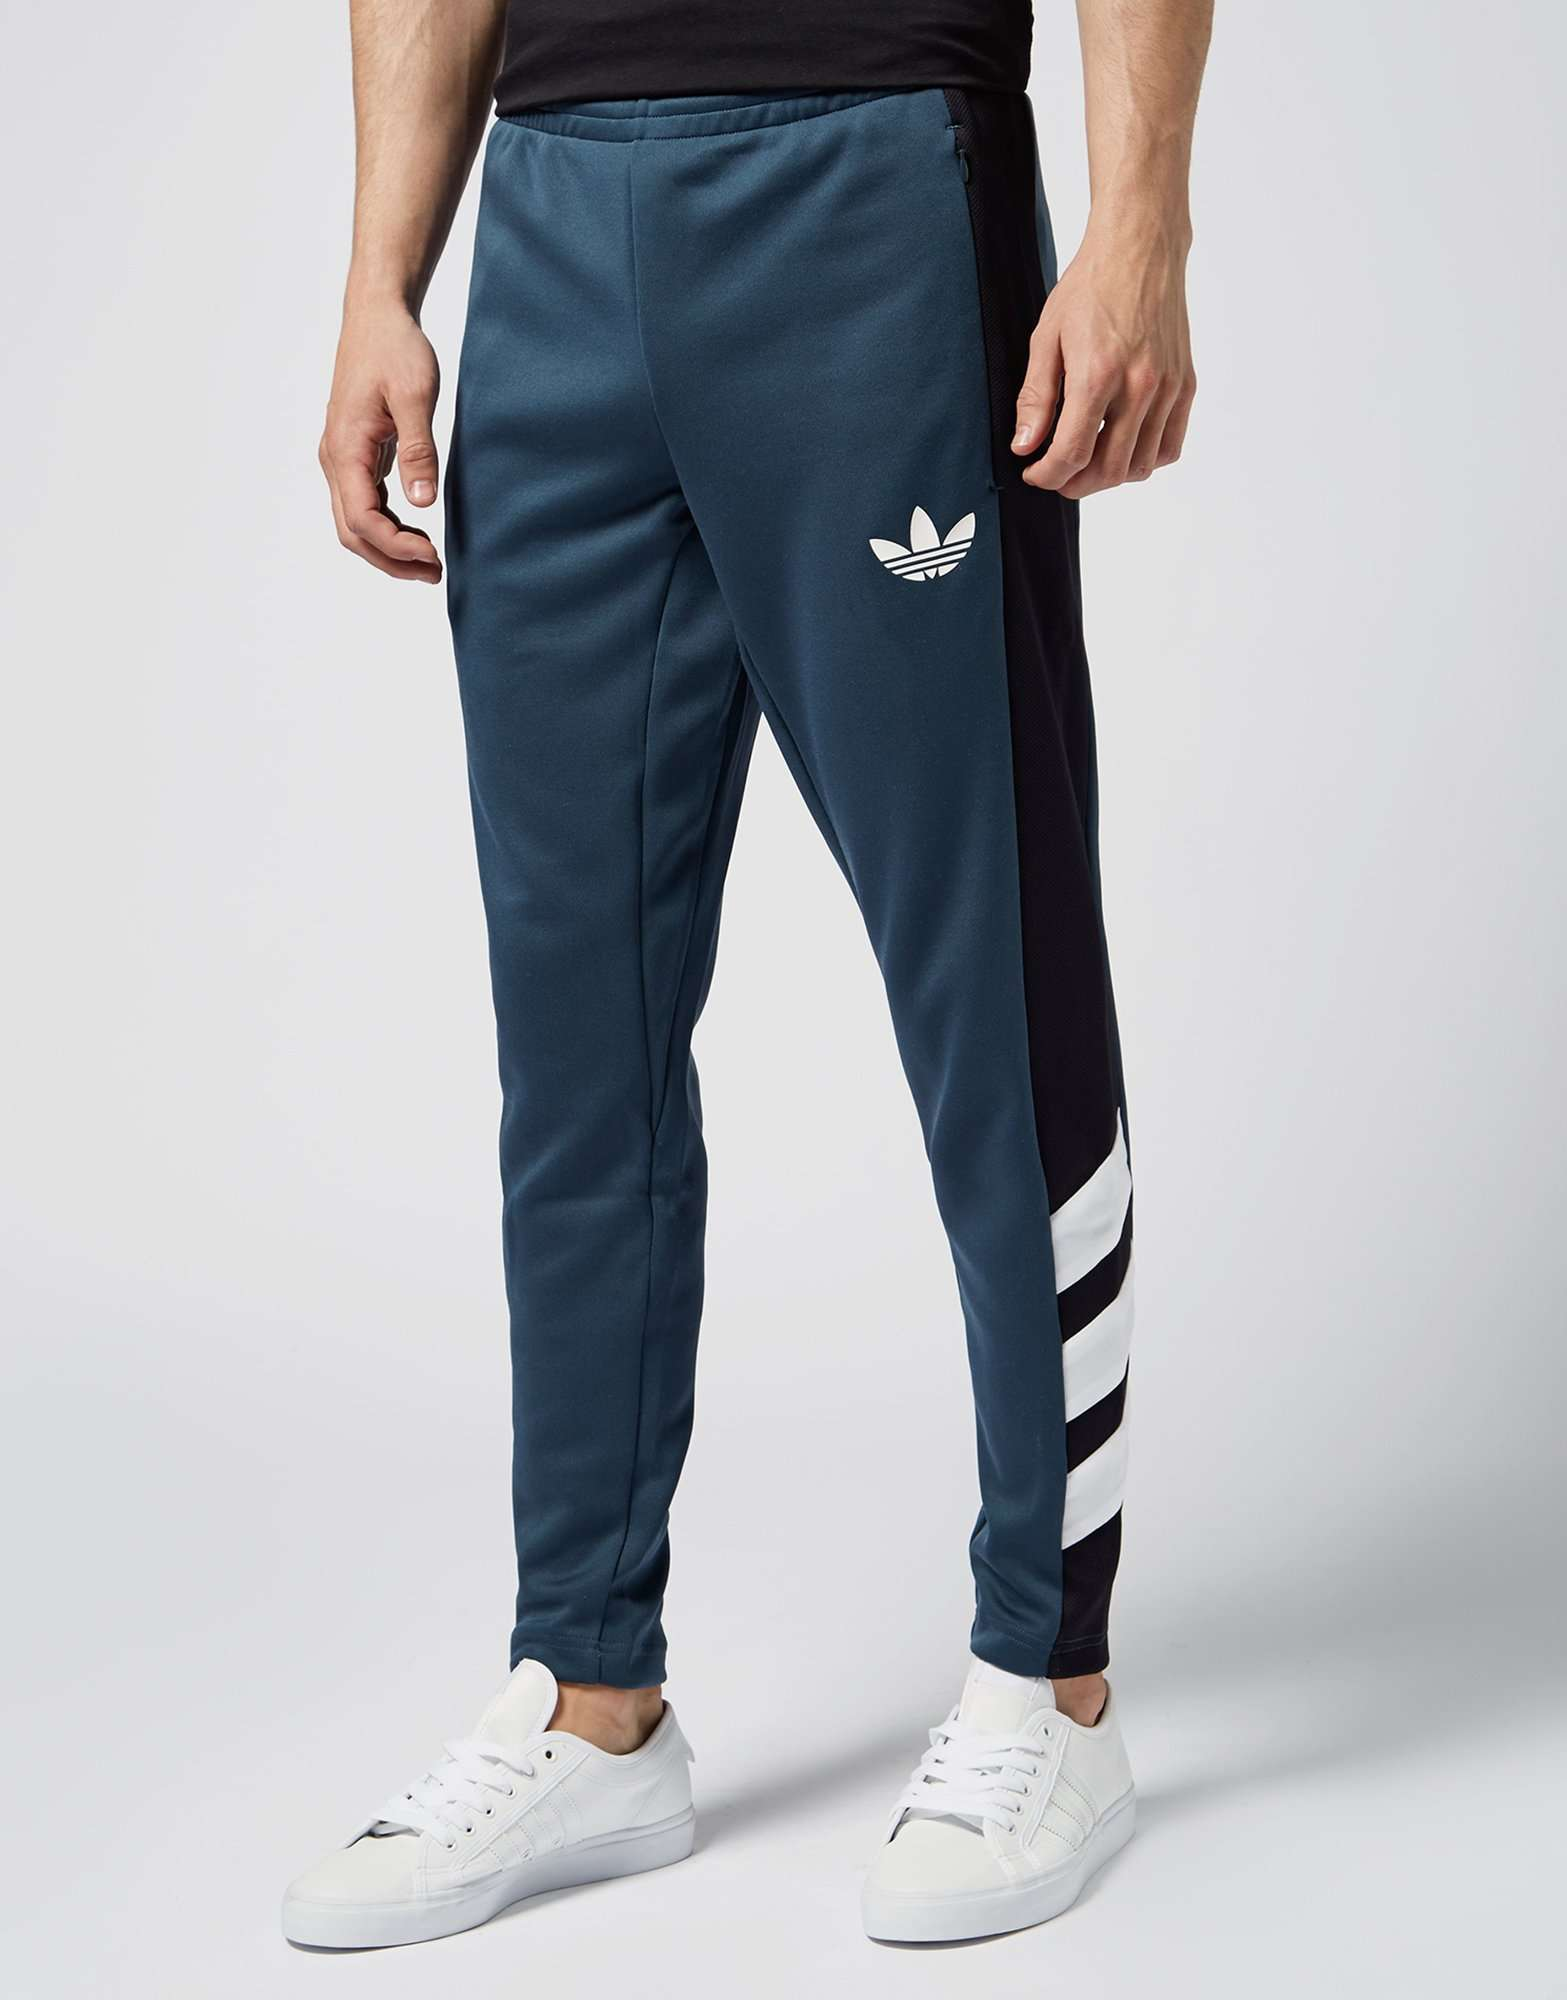 Adidas Originals Trefoil Track Pants  Scotts Menswear-1391